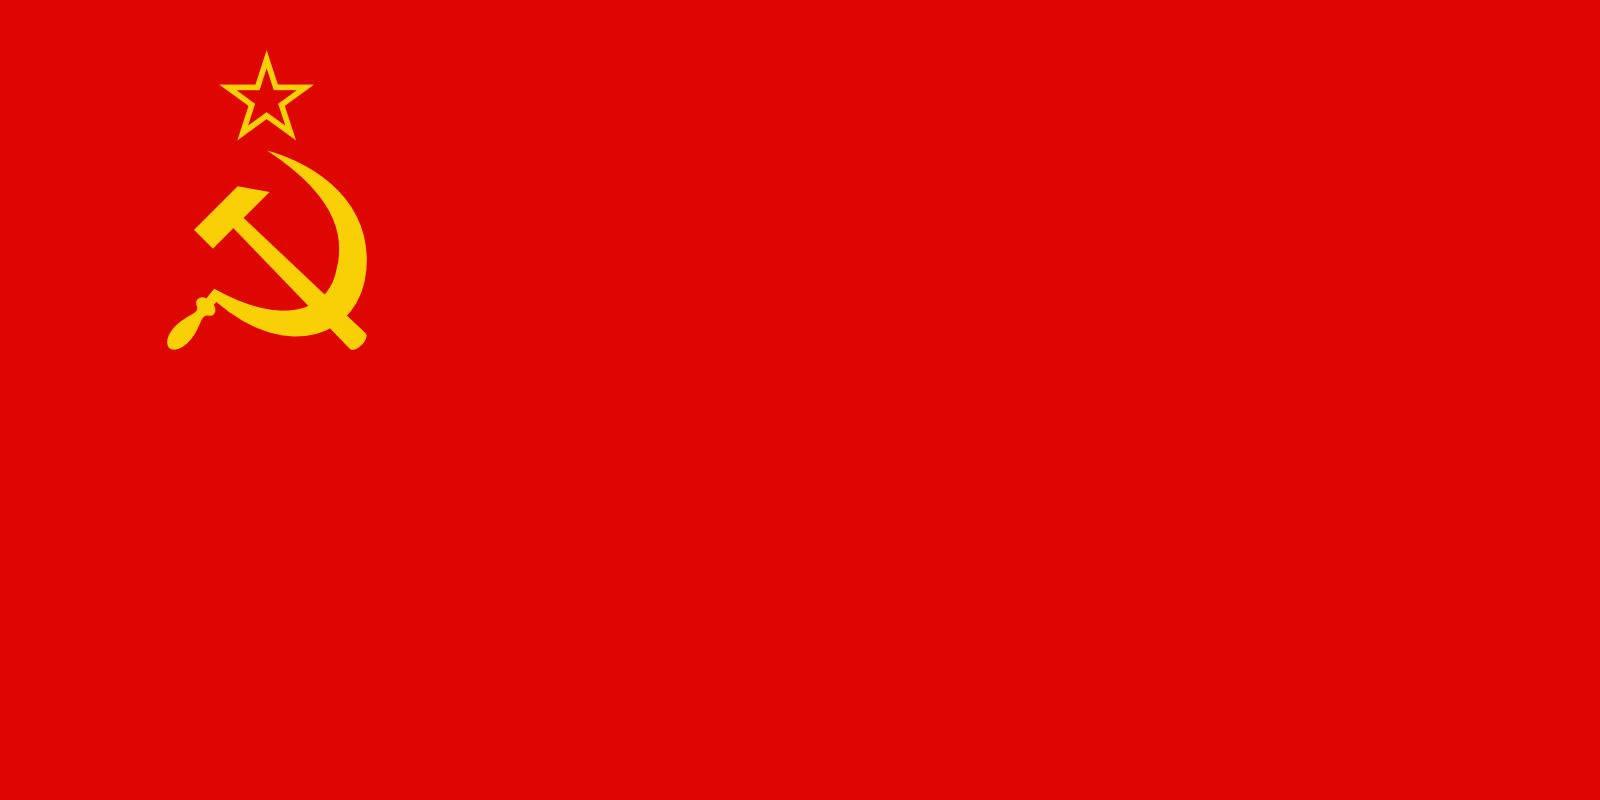 HQ Flag Of United Soviet Socialist Republics Wallpapers | File 24.33Kb